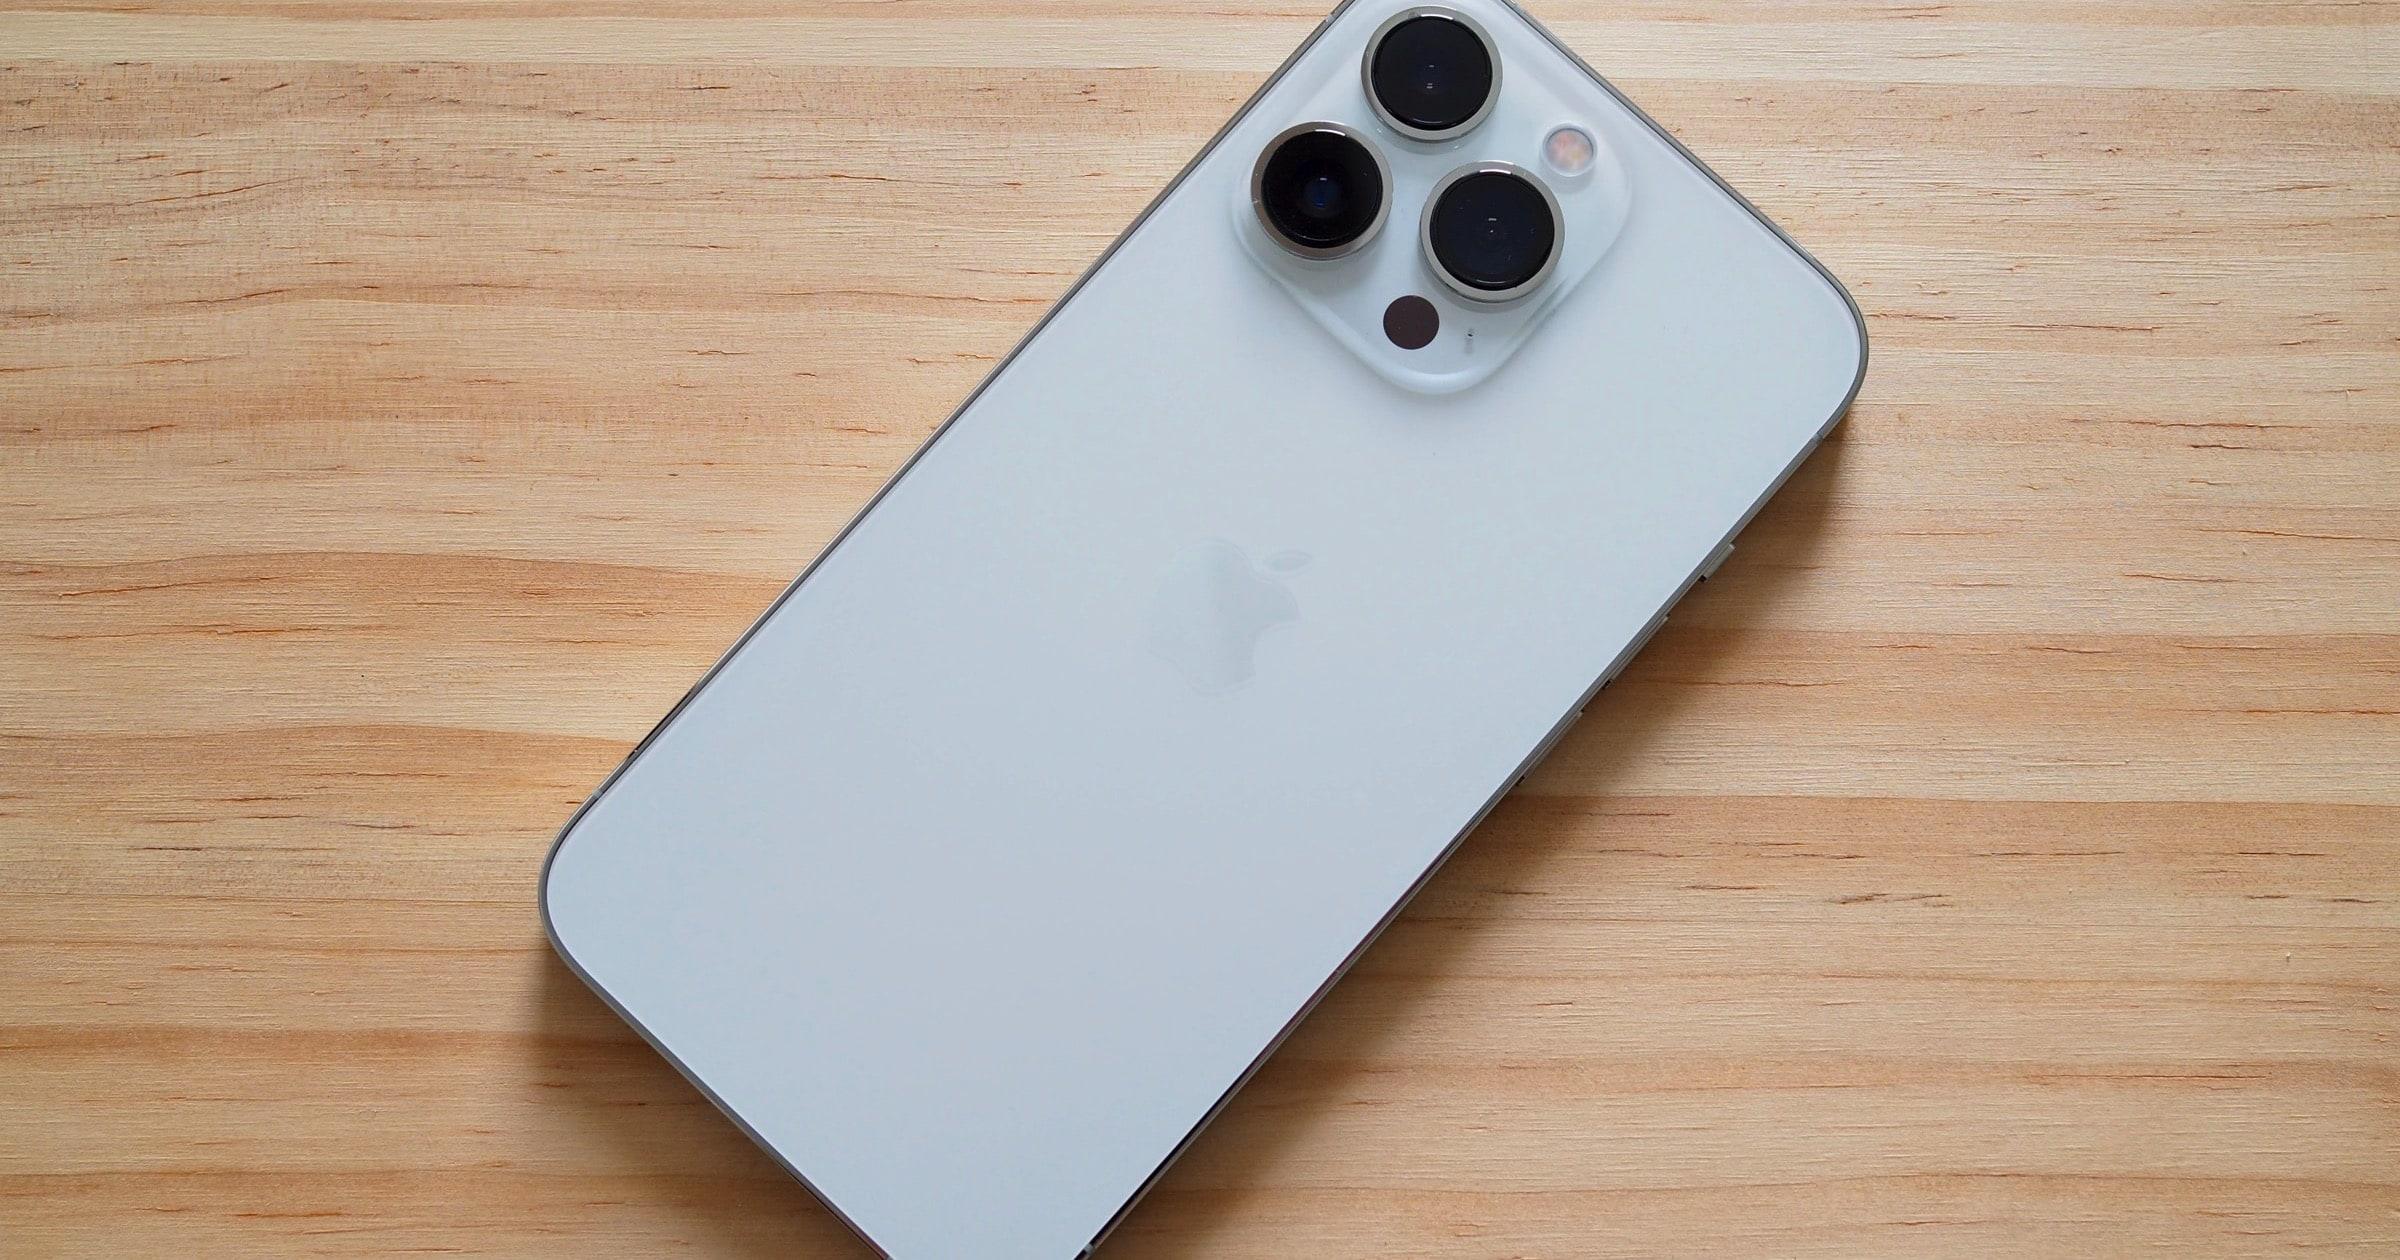 iPhone 13 wood background